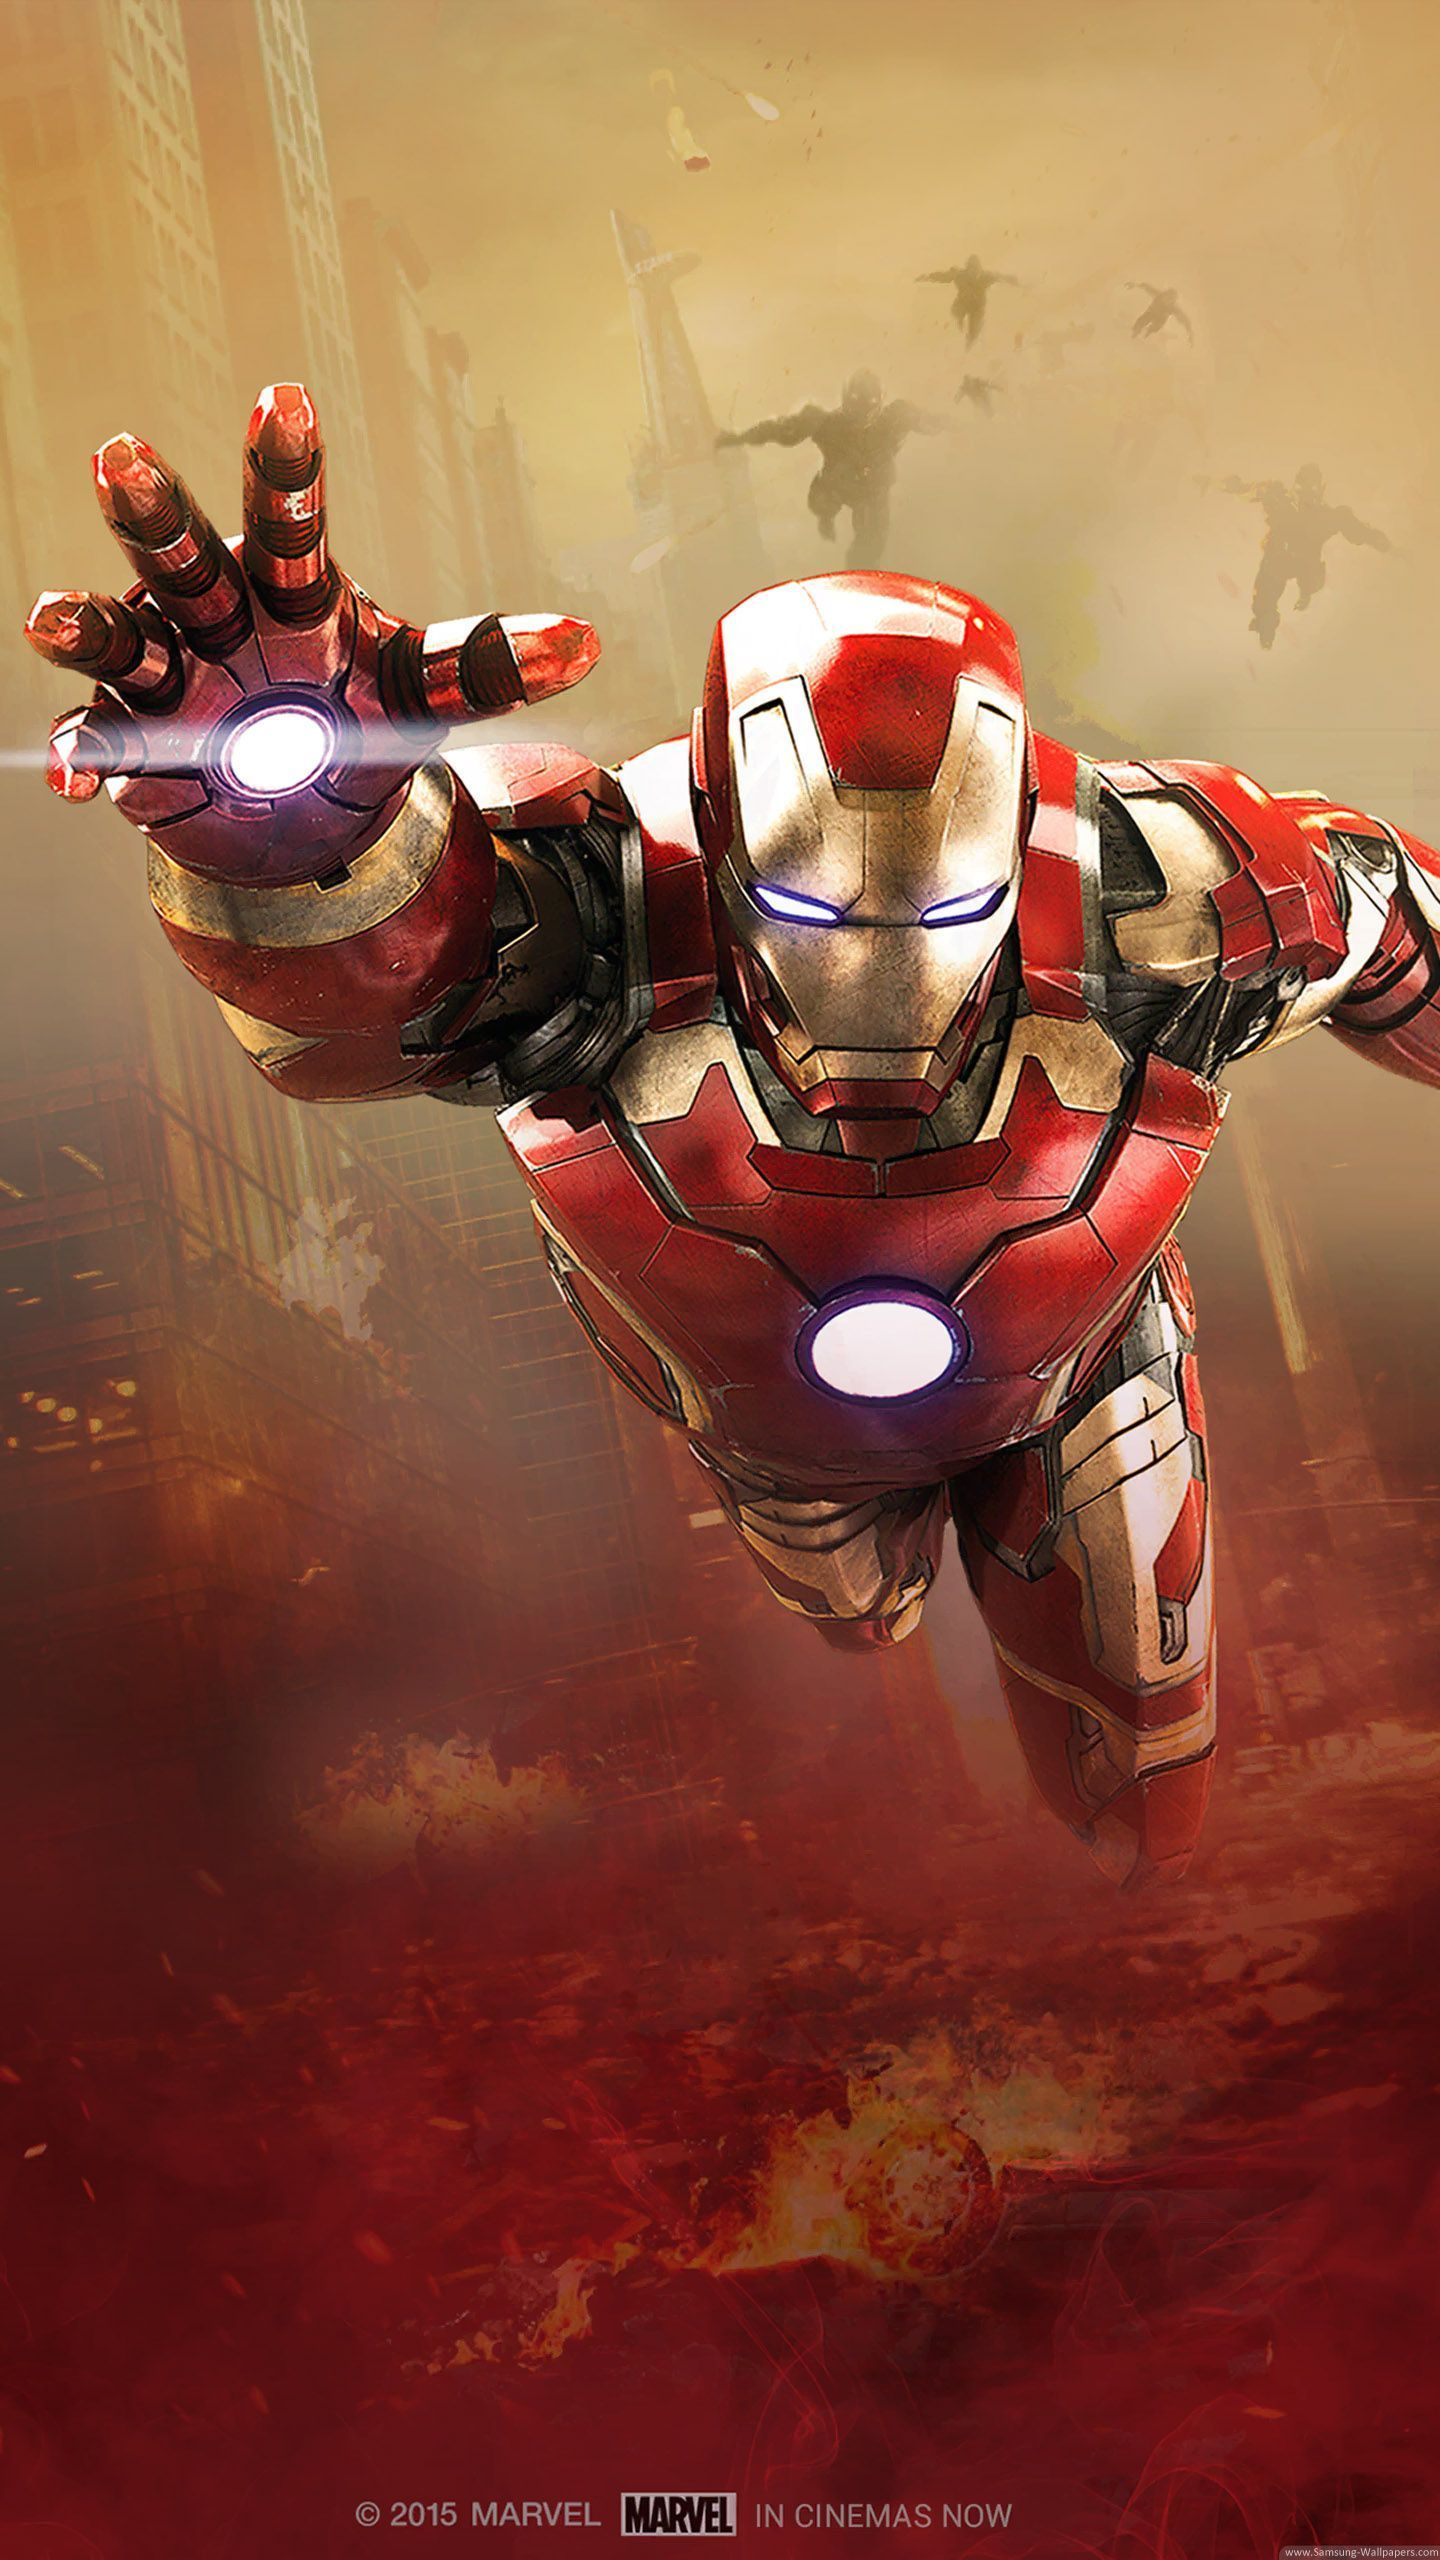 Iron Man Phone Wallpapers Top Free Iron Man Phone